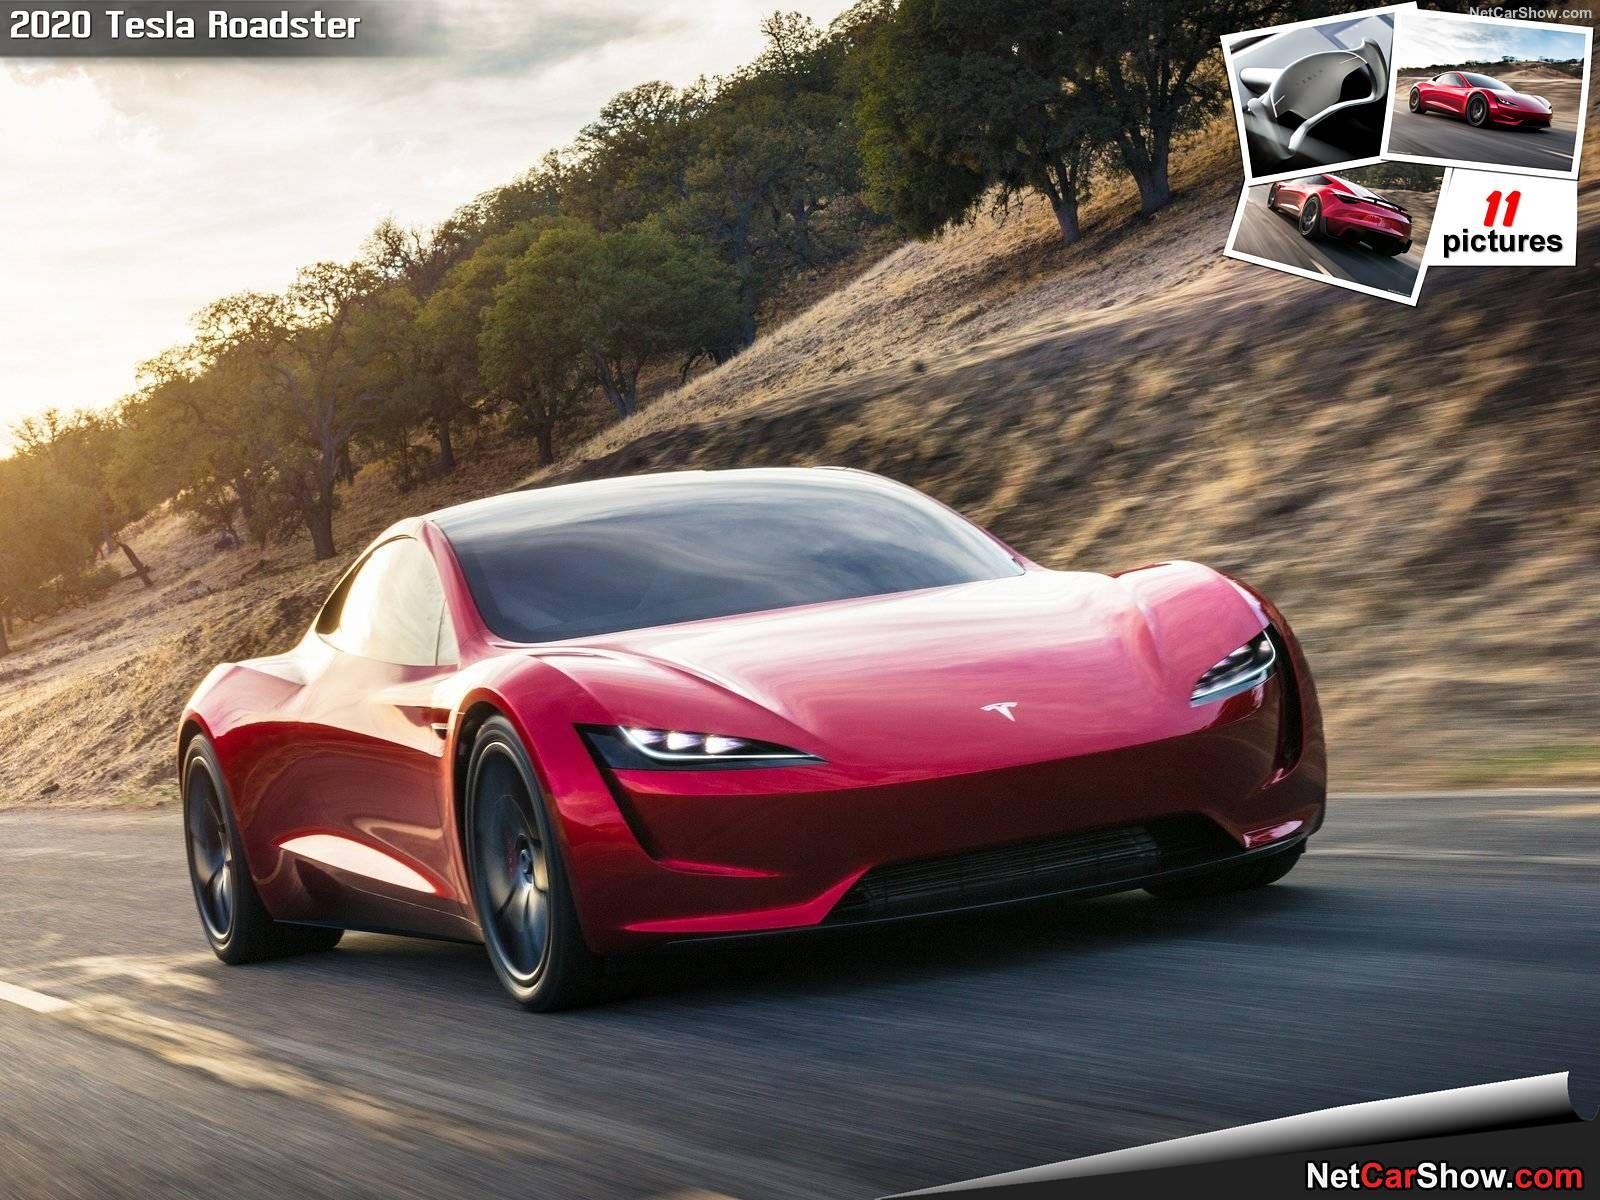 Wallpaper Hd Tesla Roadster 2020 Tesla Roadster New Tesla Roadster Tesla Supercar